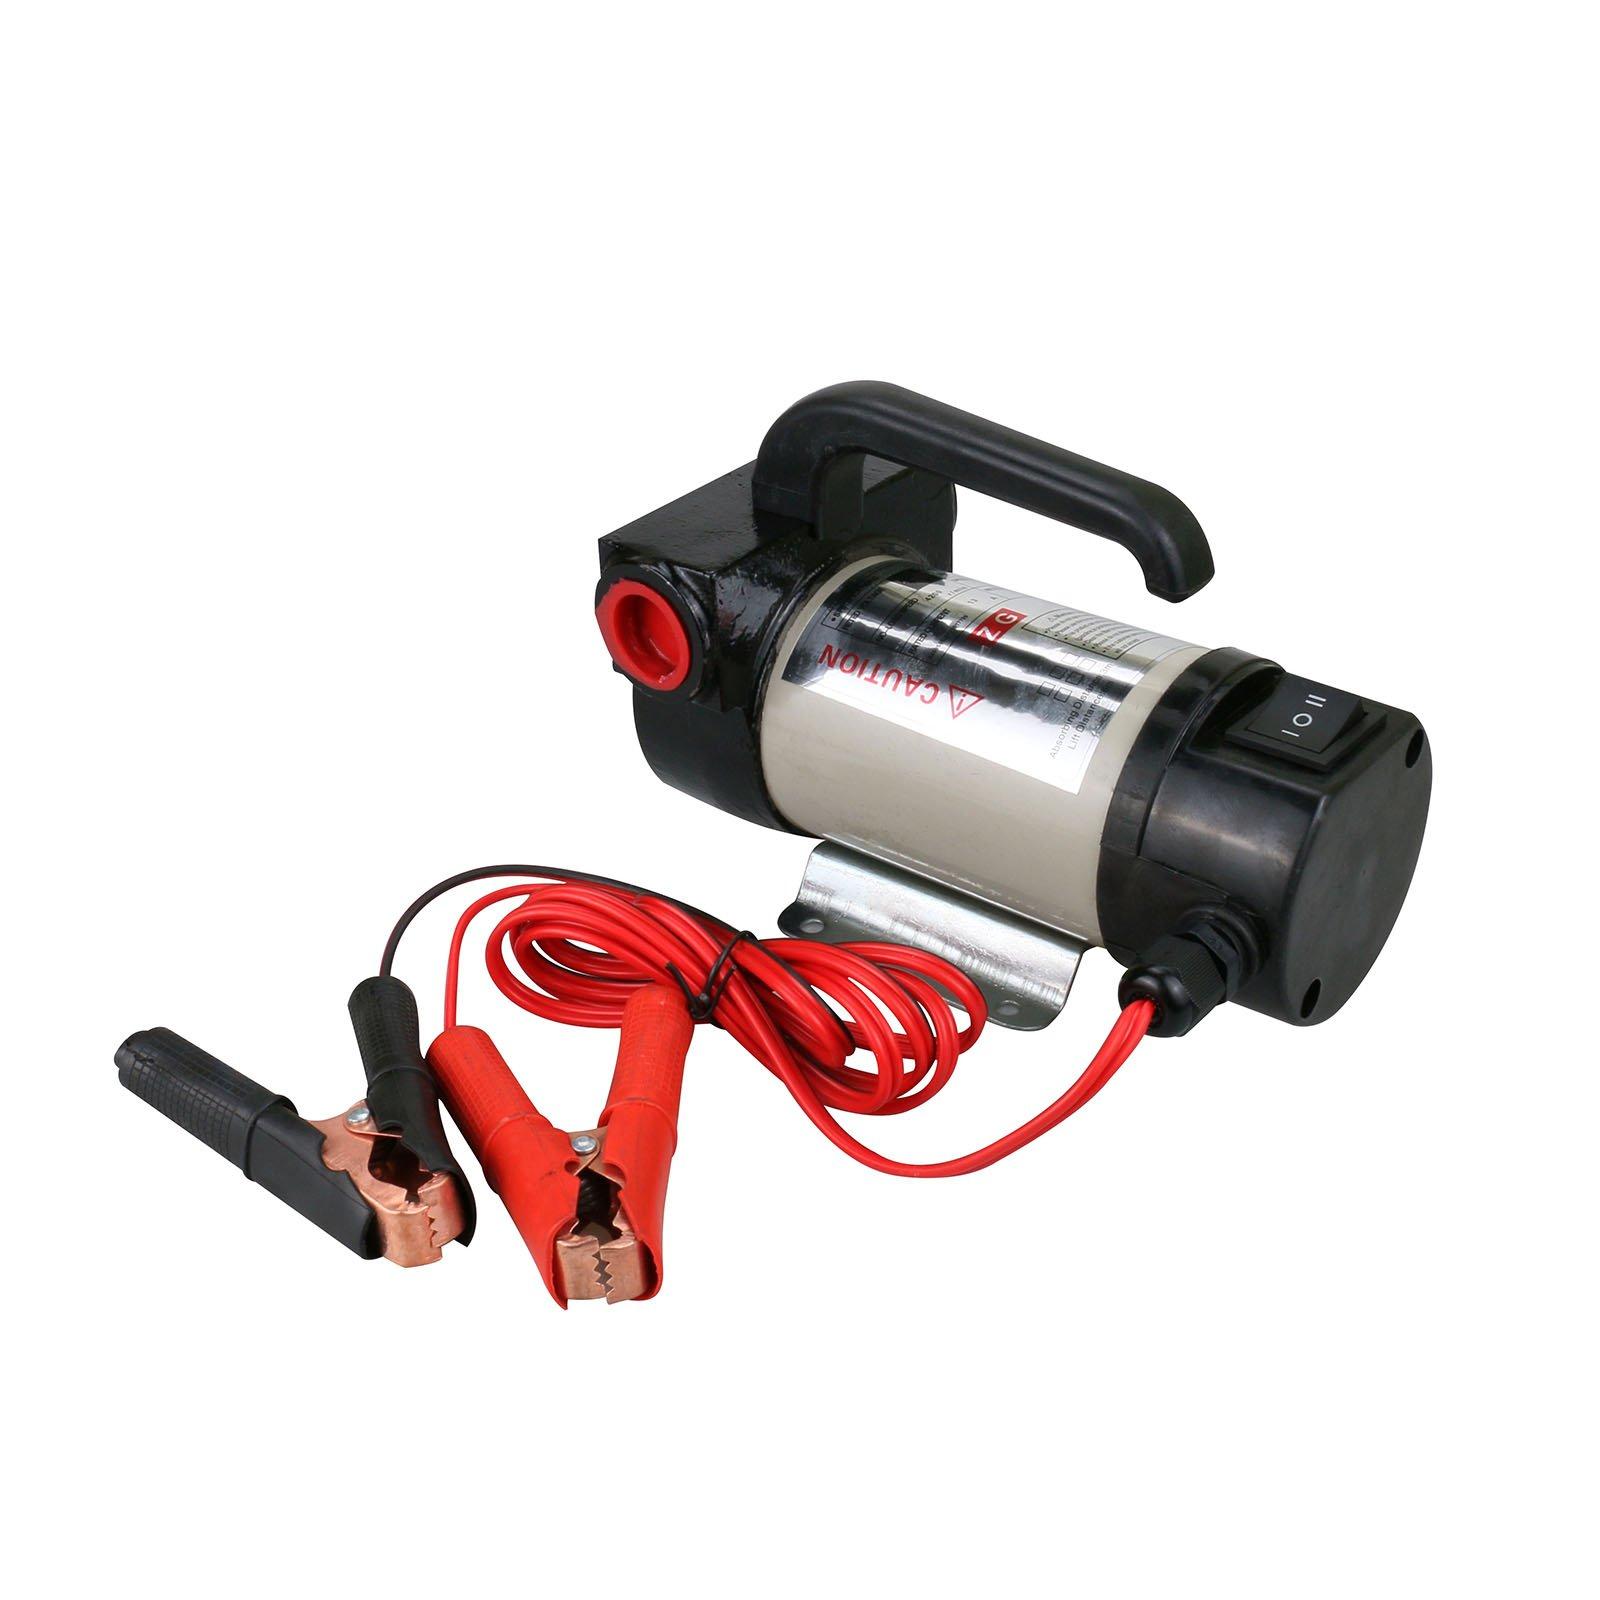 Diesel Oil Transfer Pump, Electric Tool Direct Current Pump Kit Alligator Clip 50L/min 24V DC